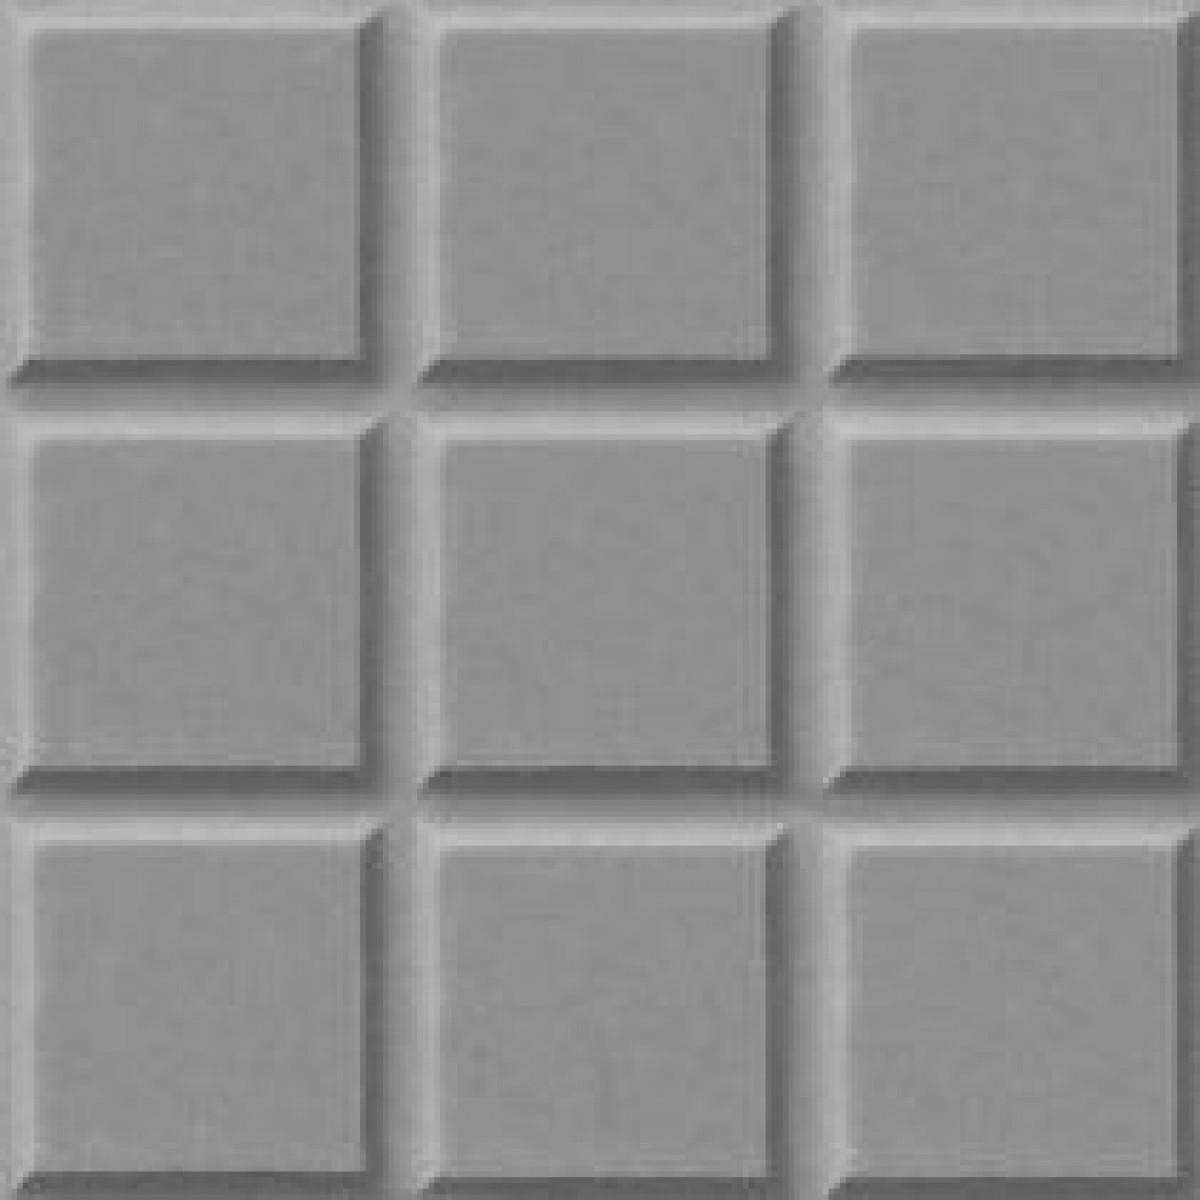 Foto2 - Ladrilho Xadrez 9 Quadros FP051 20X20X1,5 25PÇAS P/M²